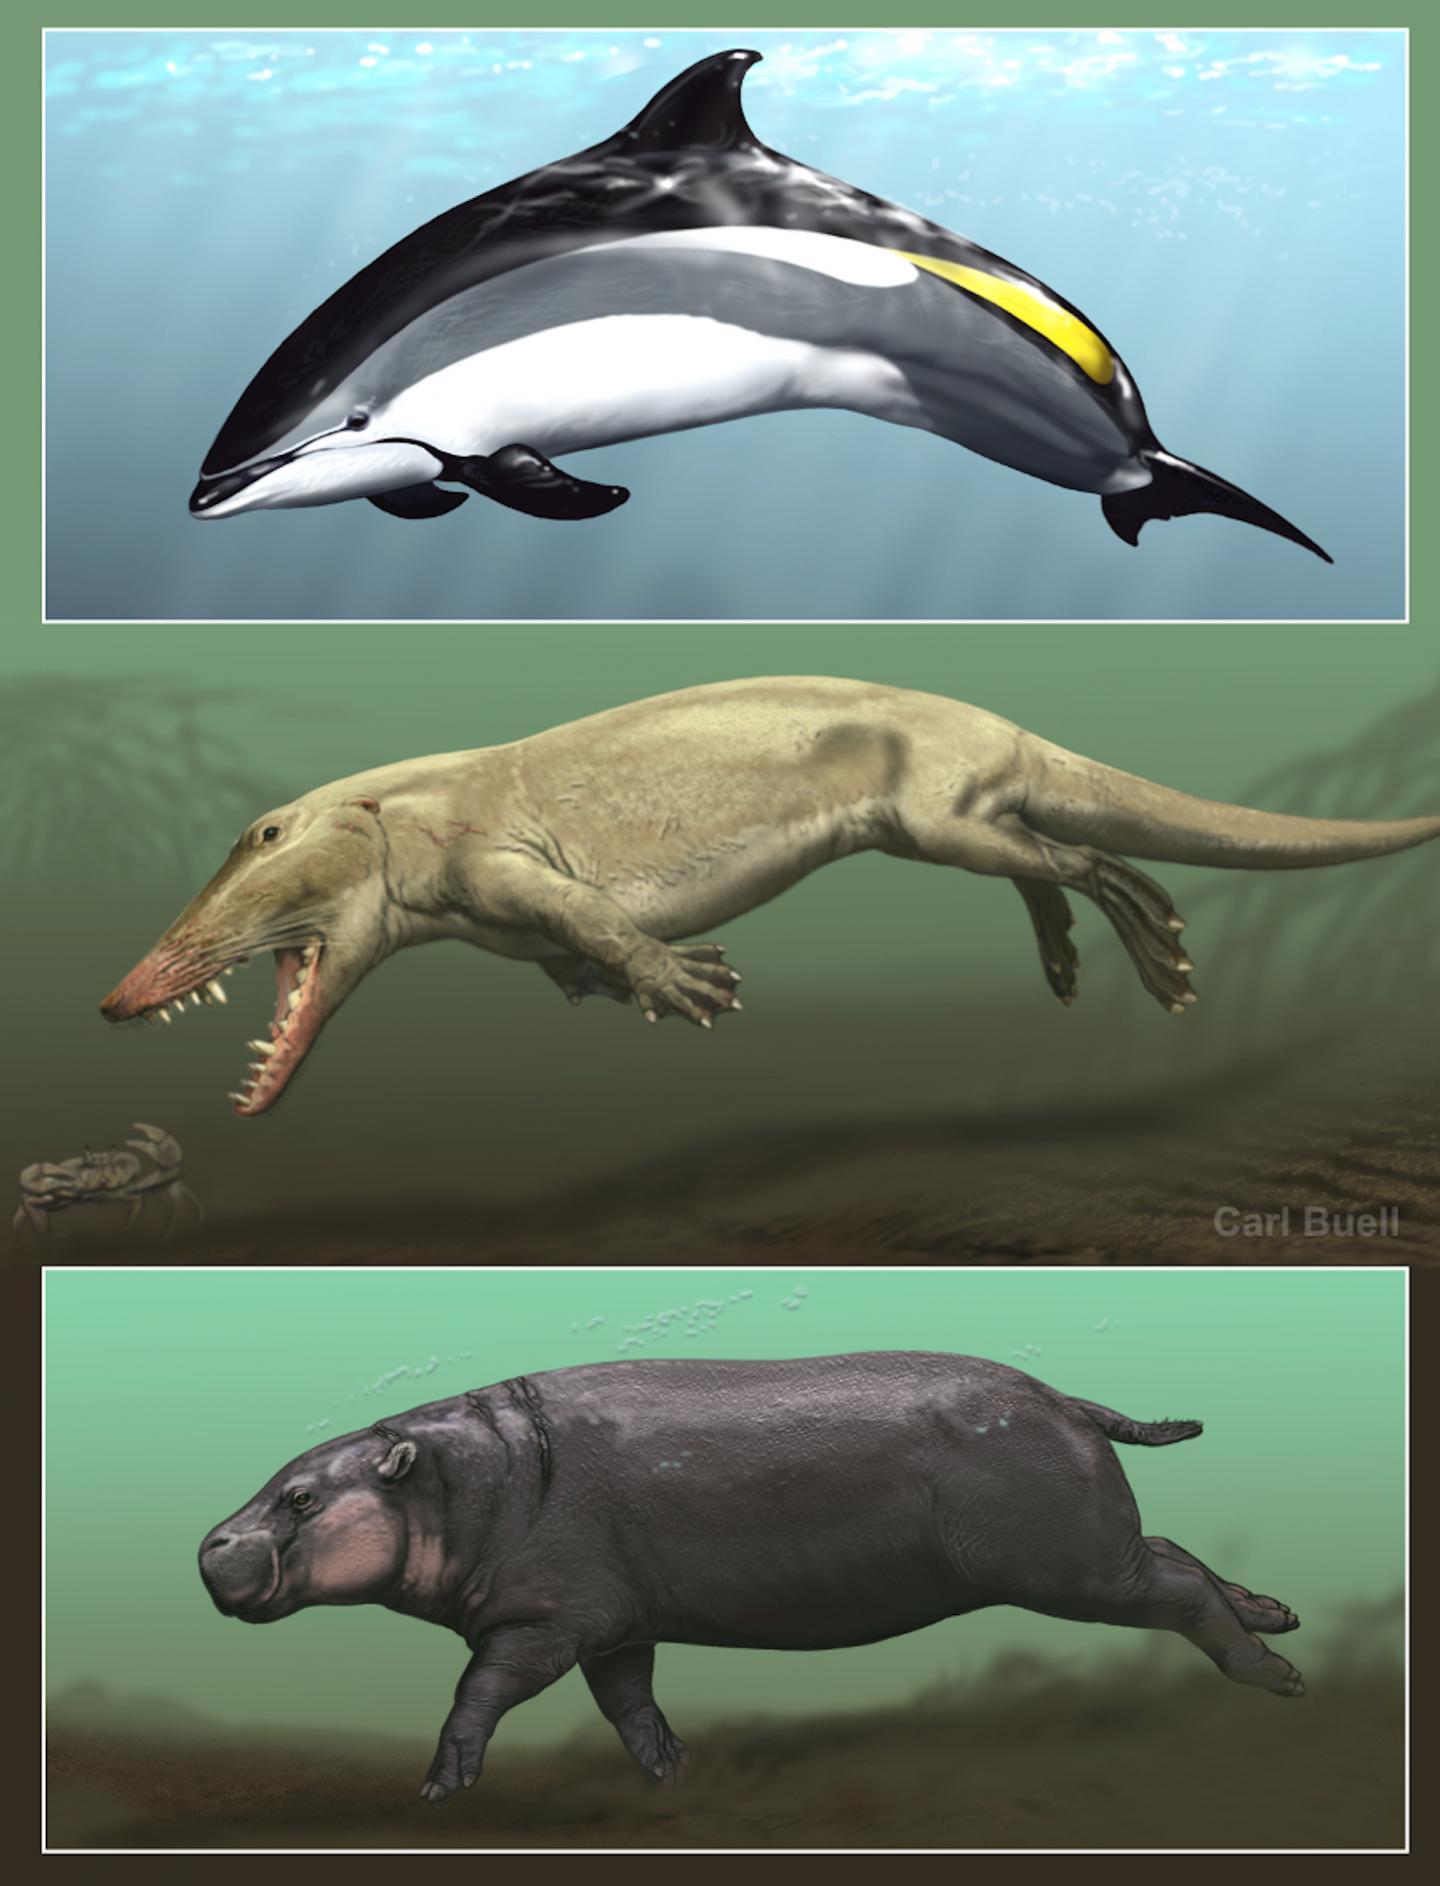 Cetacean hippo ancestor